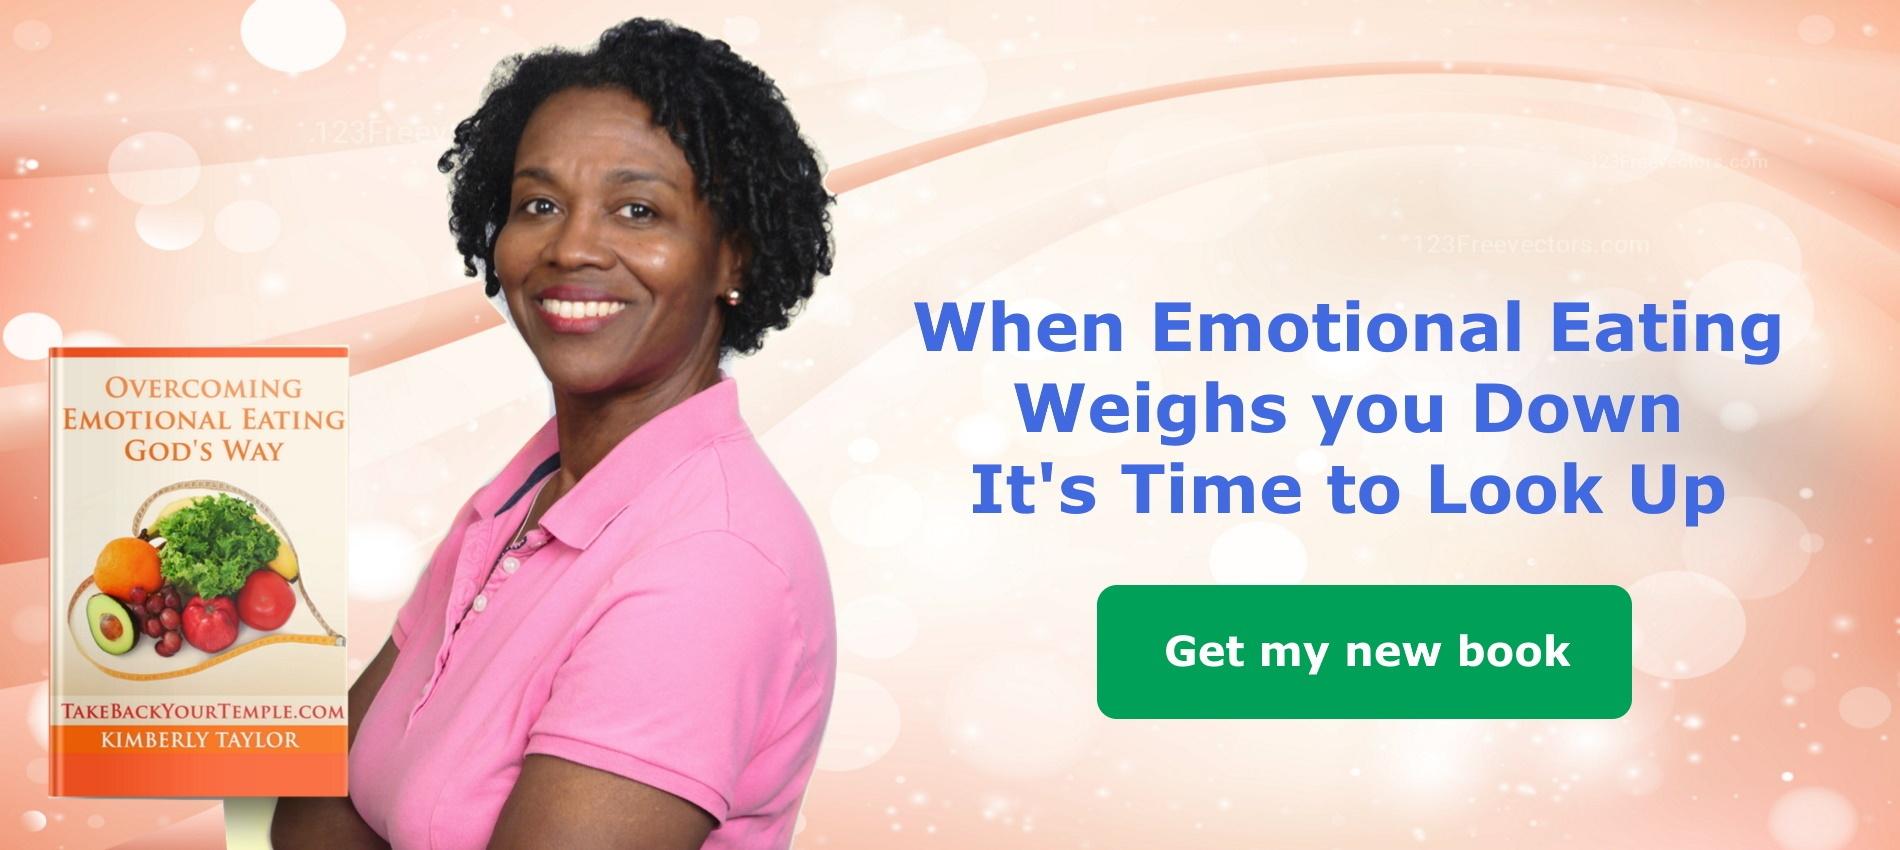 Overcoming Emotional Eating God's Way